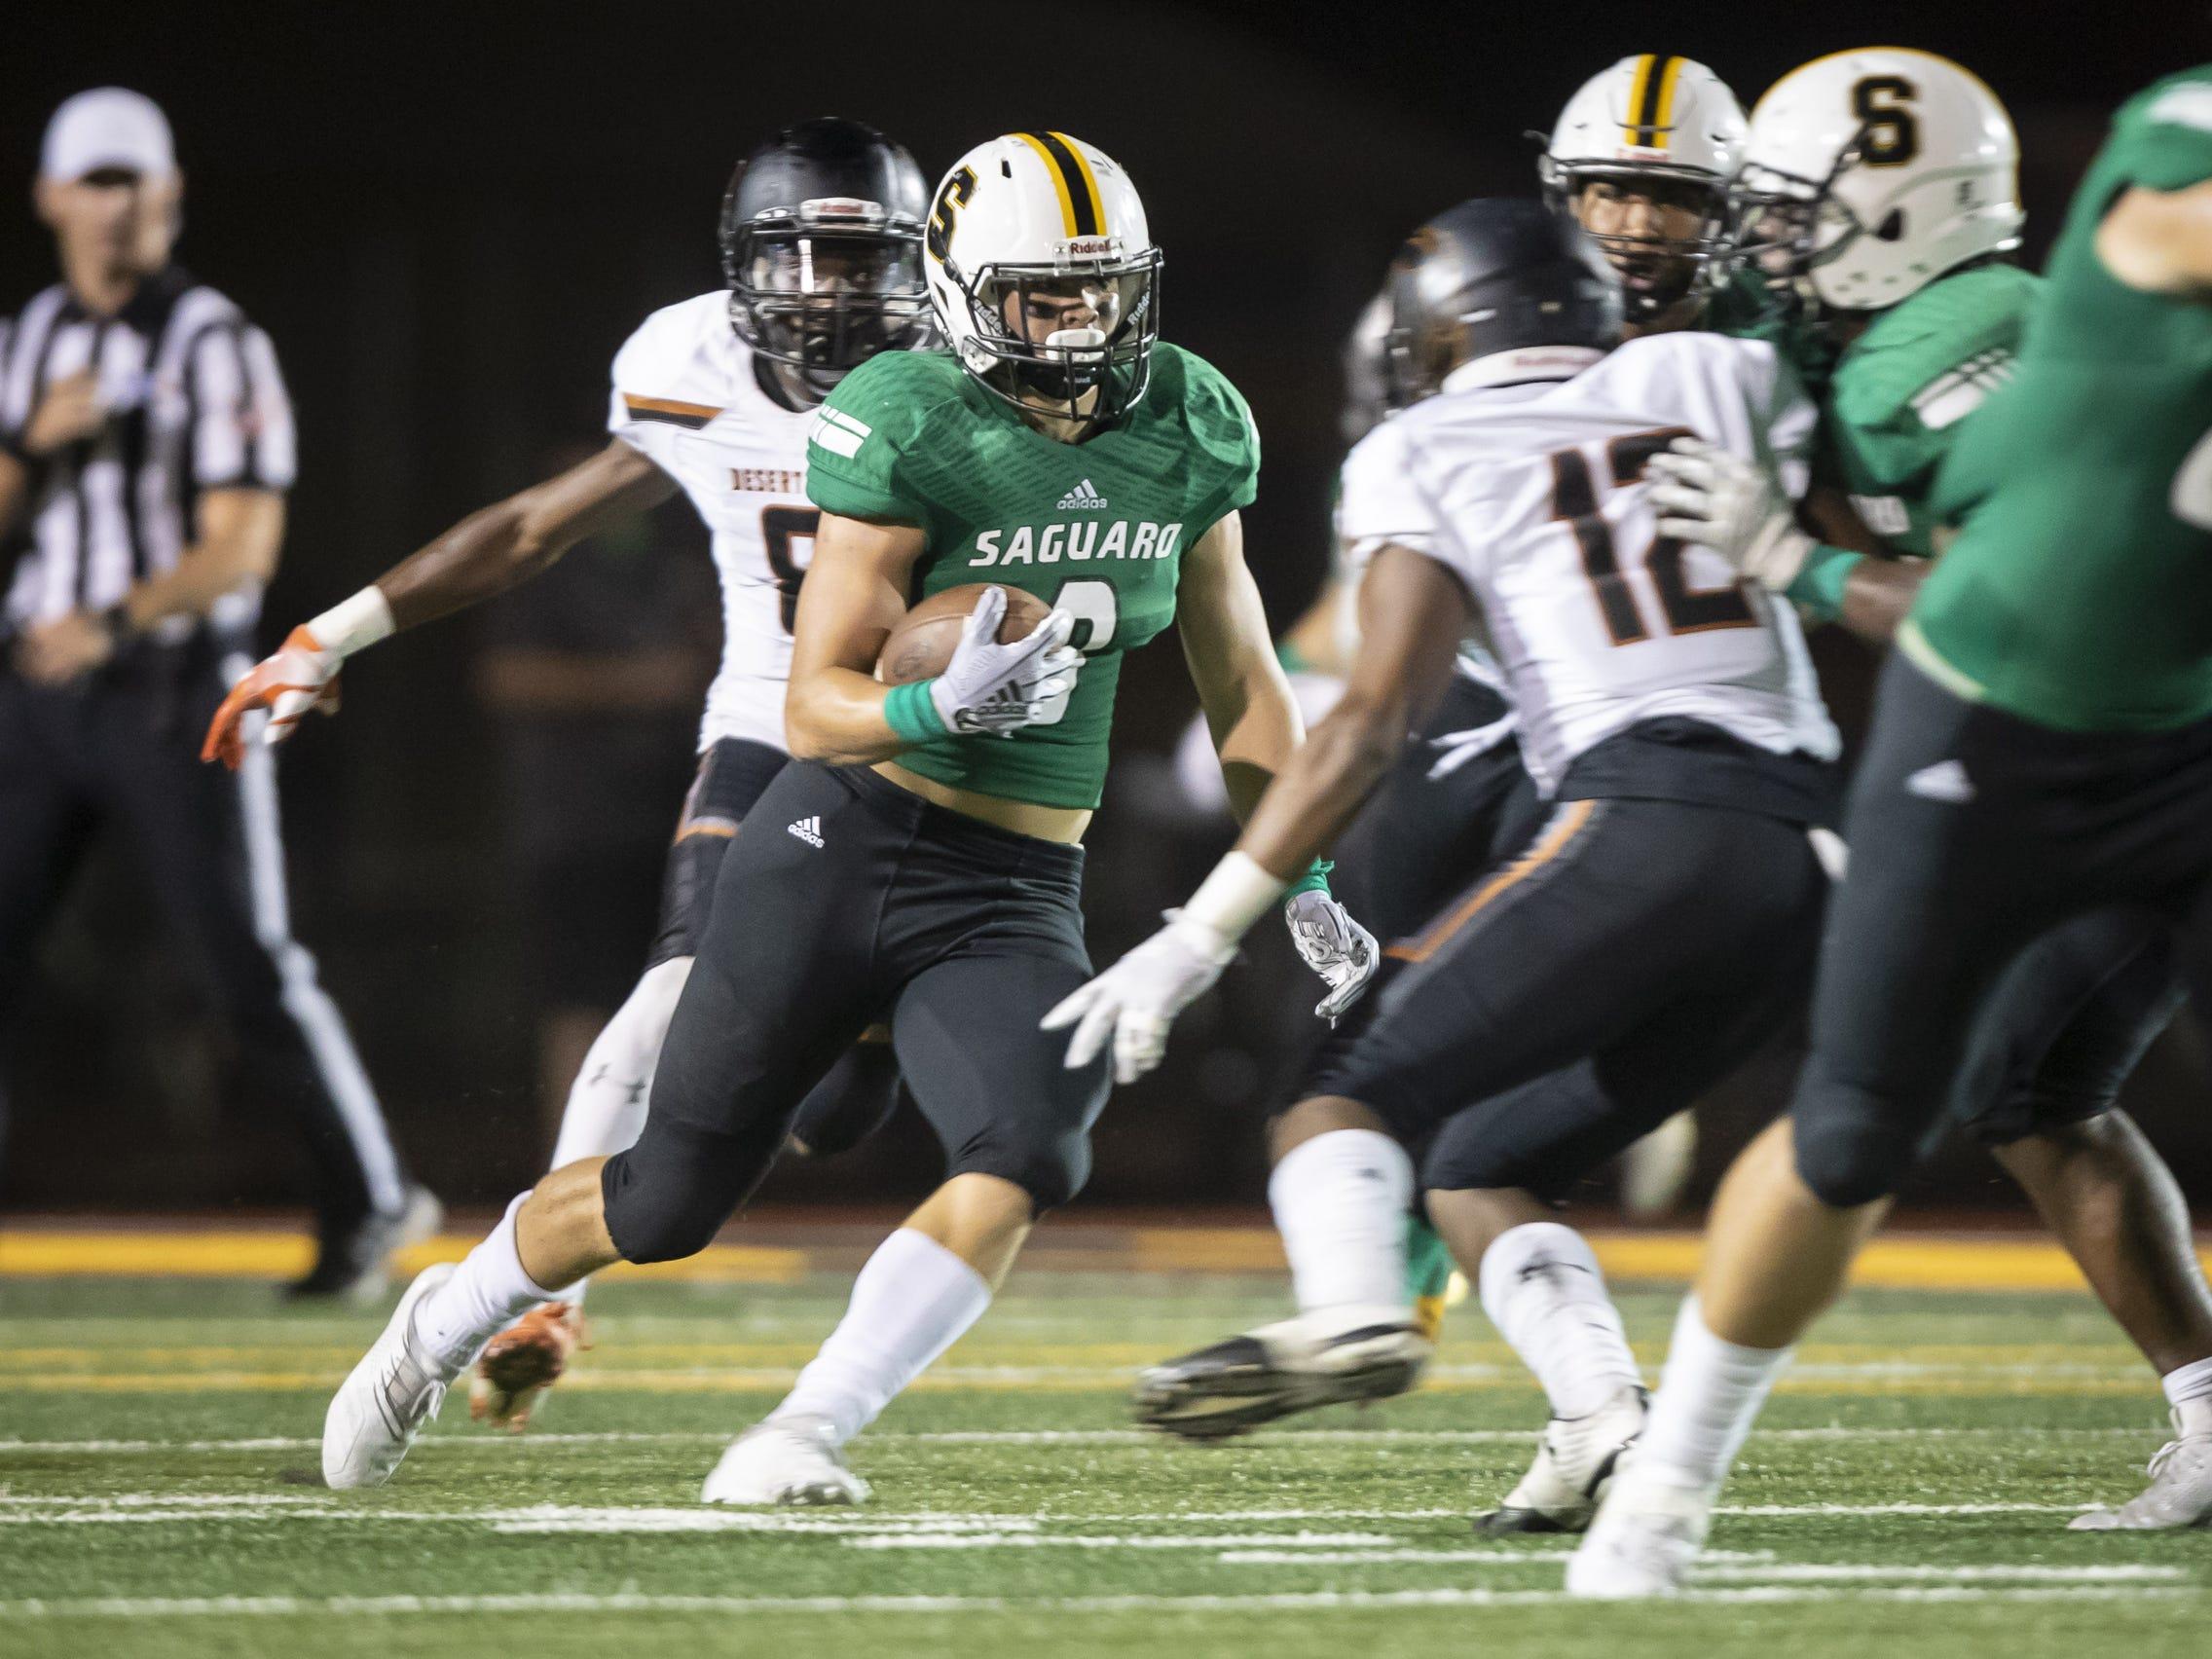 Sophomore quarterback Frank Schafroth (16) of the Saguaro Sabercats runs the ball against the Desert Edge Scorpions at Saguaro High School on Friday, September 28, 2018 in Scottsdale, Arizona. #azhsfb